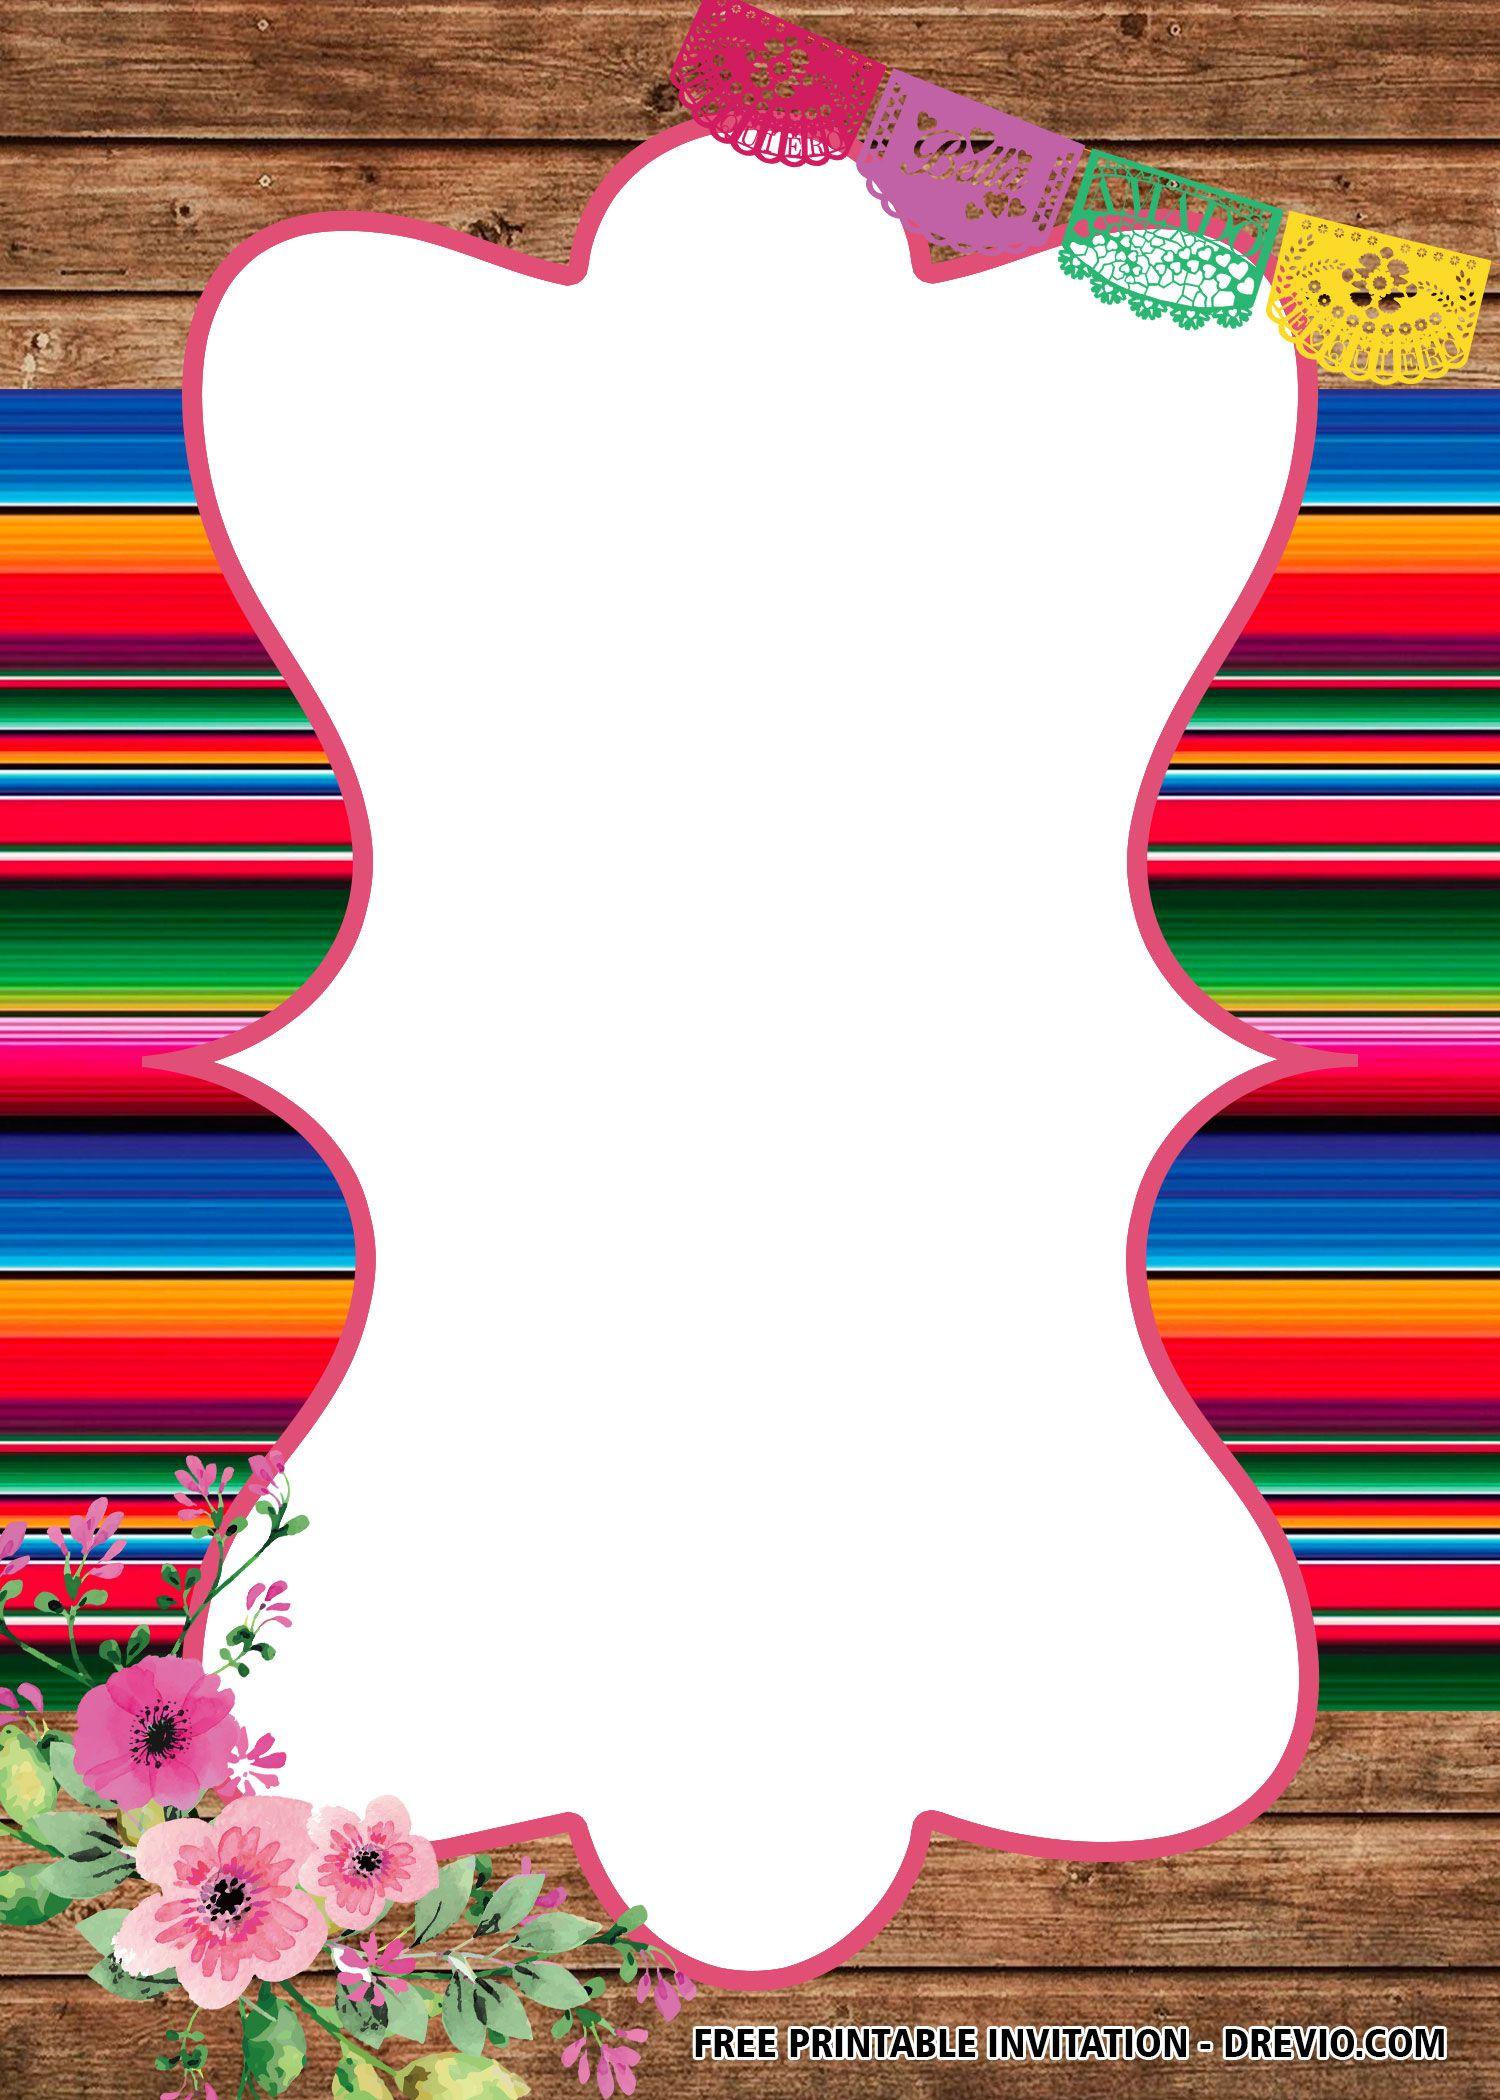 Free Fiesta Baby Shower Invitation Templates Fiesta Baby Shower Invitations Printable Birthday Invitations Fiesta Invitations